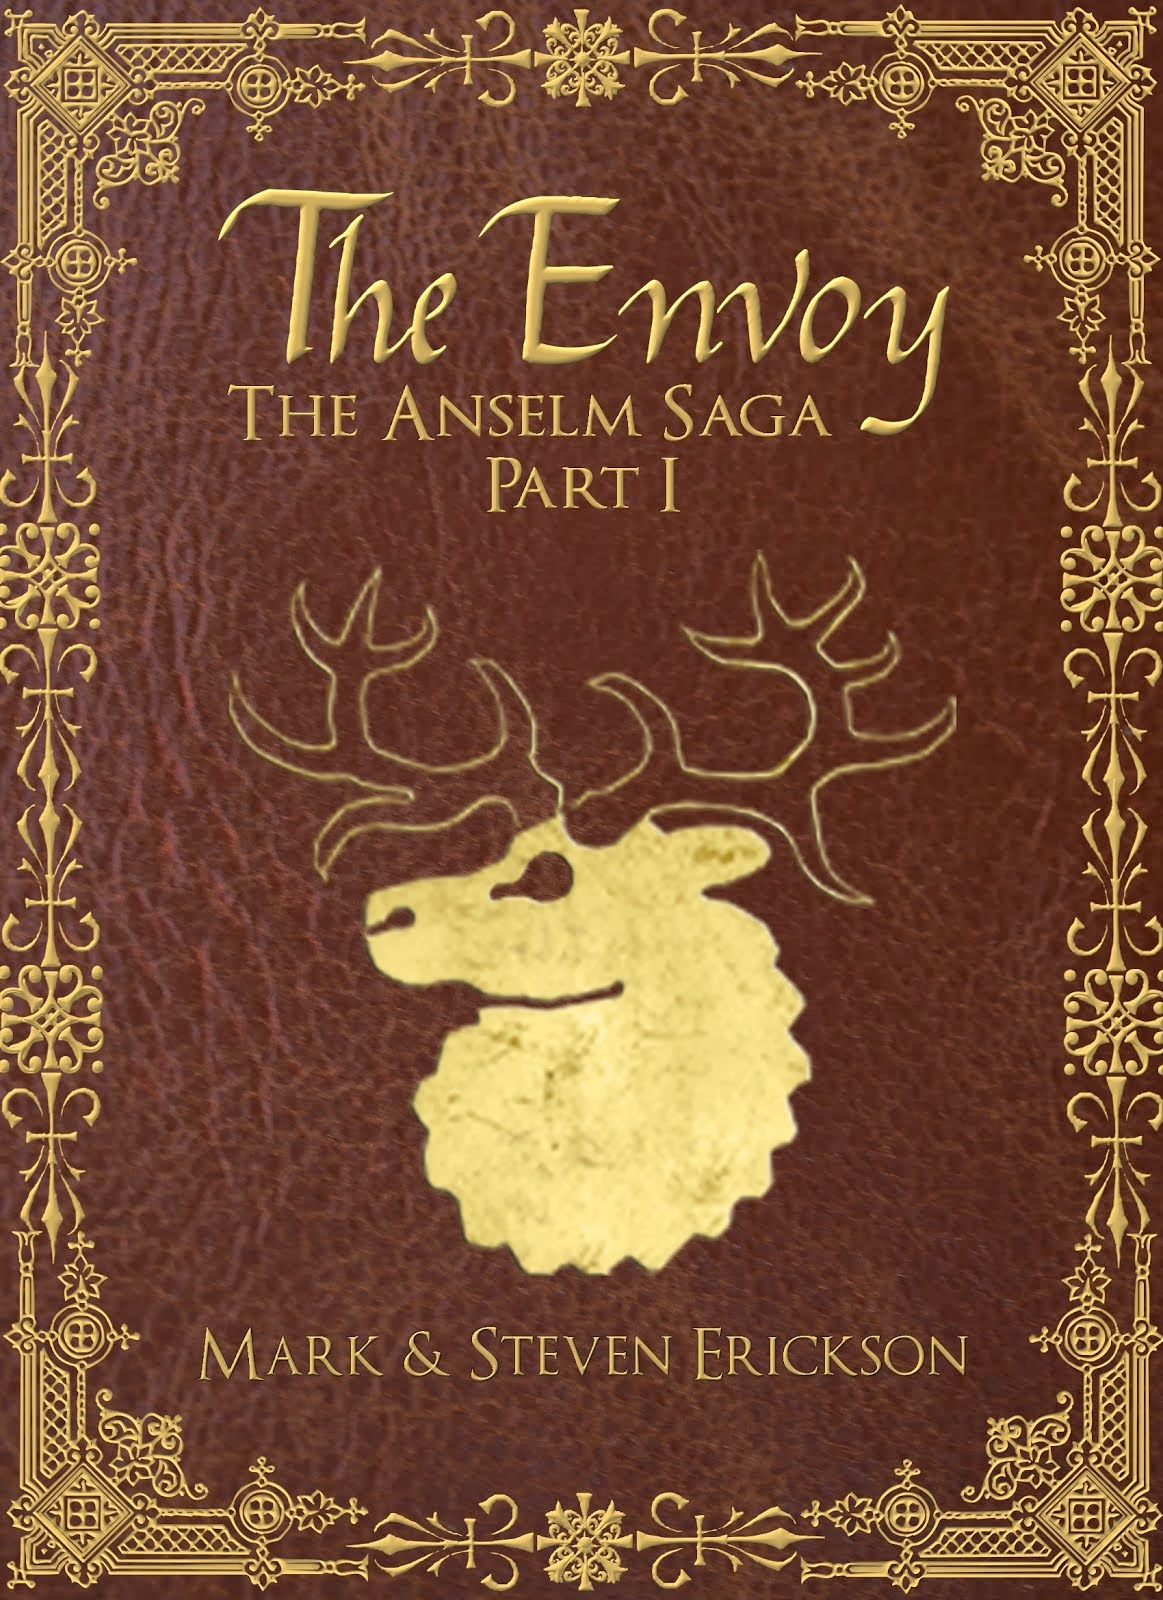 The Envoy - Part I of the Anselm Saga